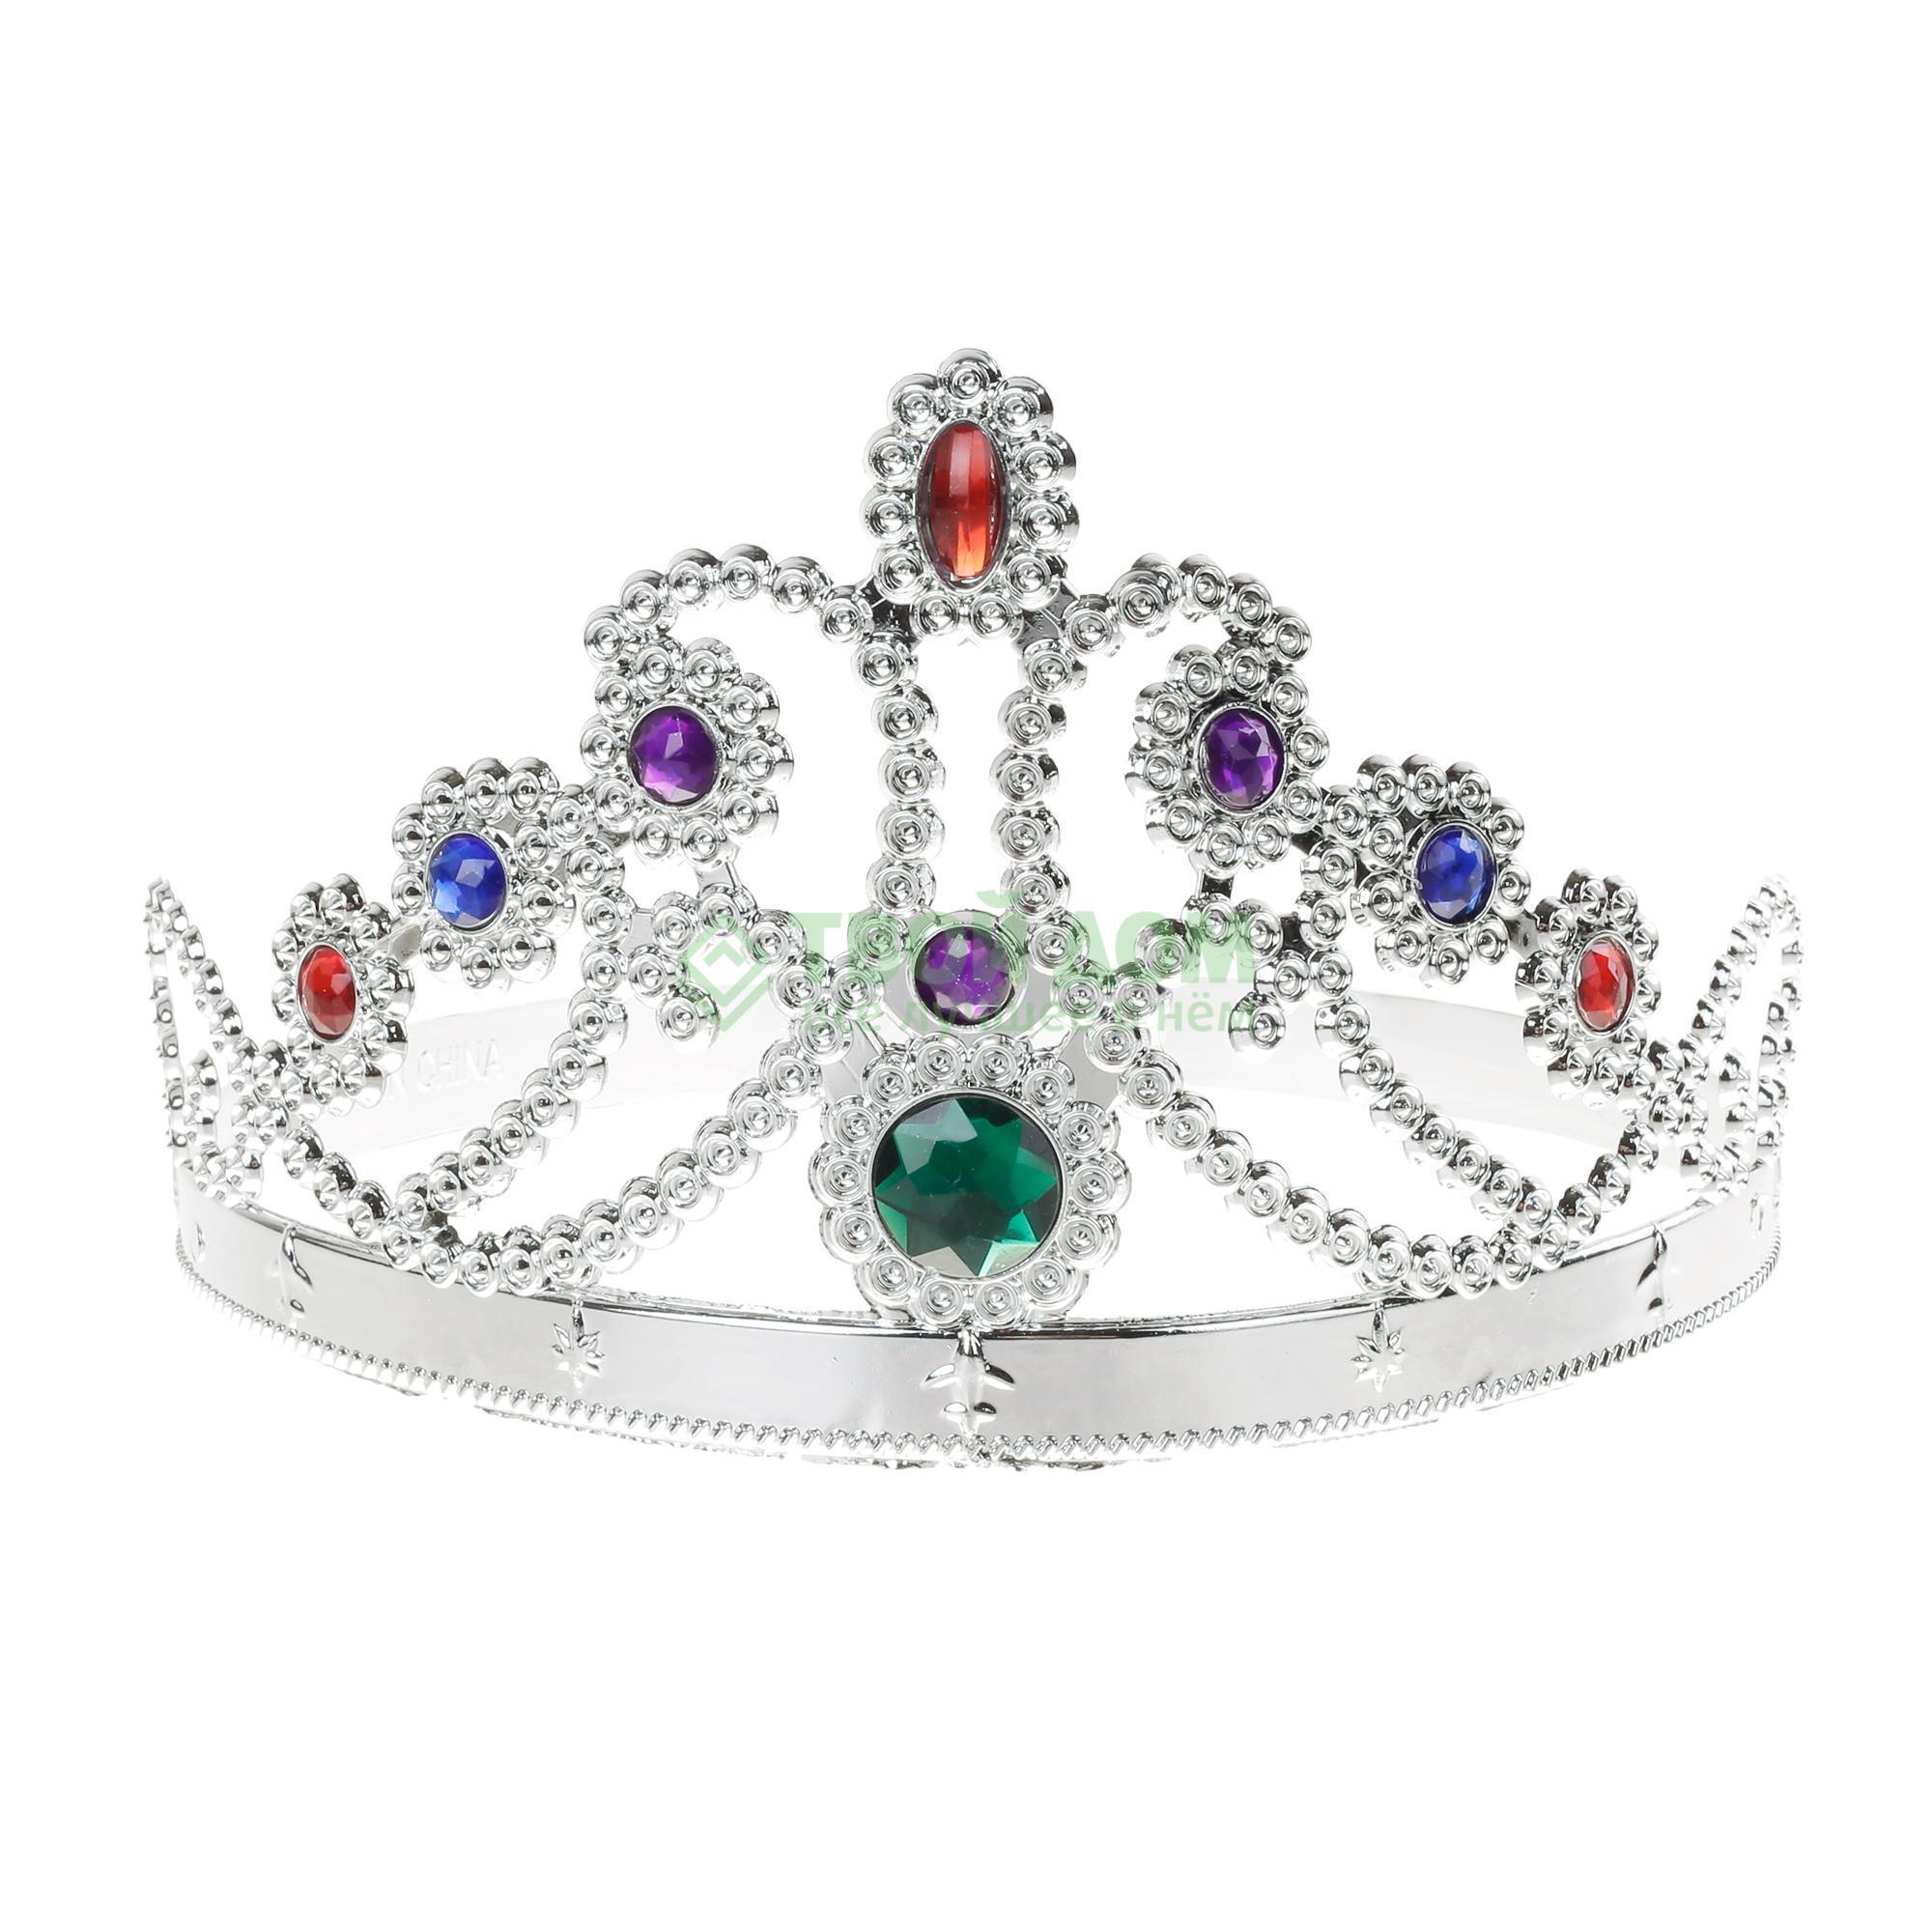 Артэ-грим Корона карнавальная царевна золотистый